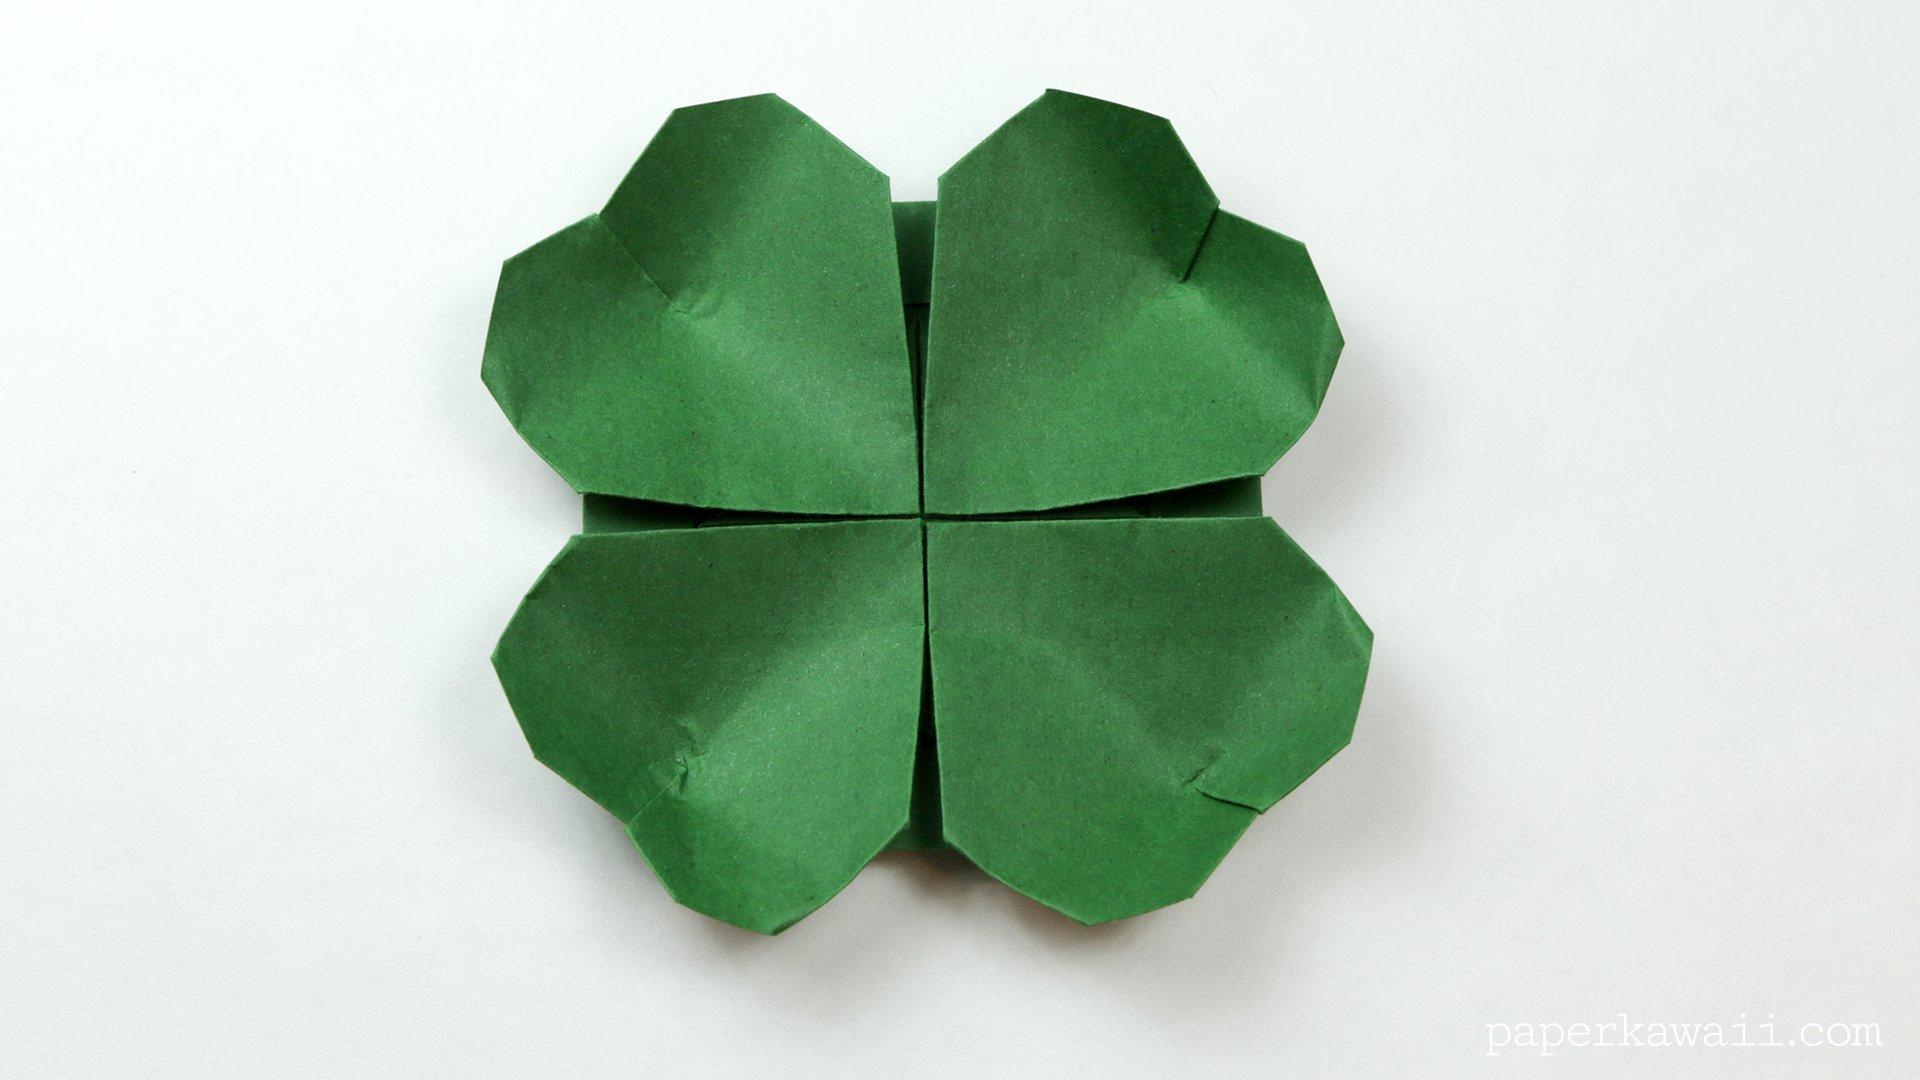 origami clover flower instructions origami diy crafts